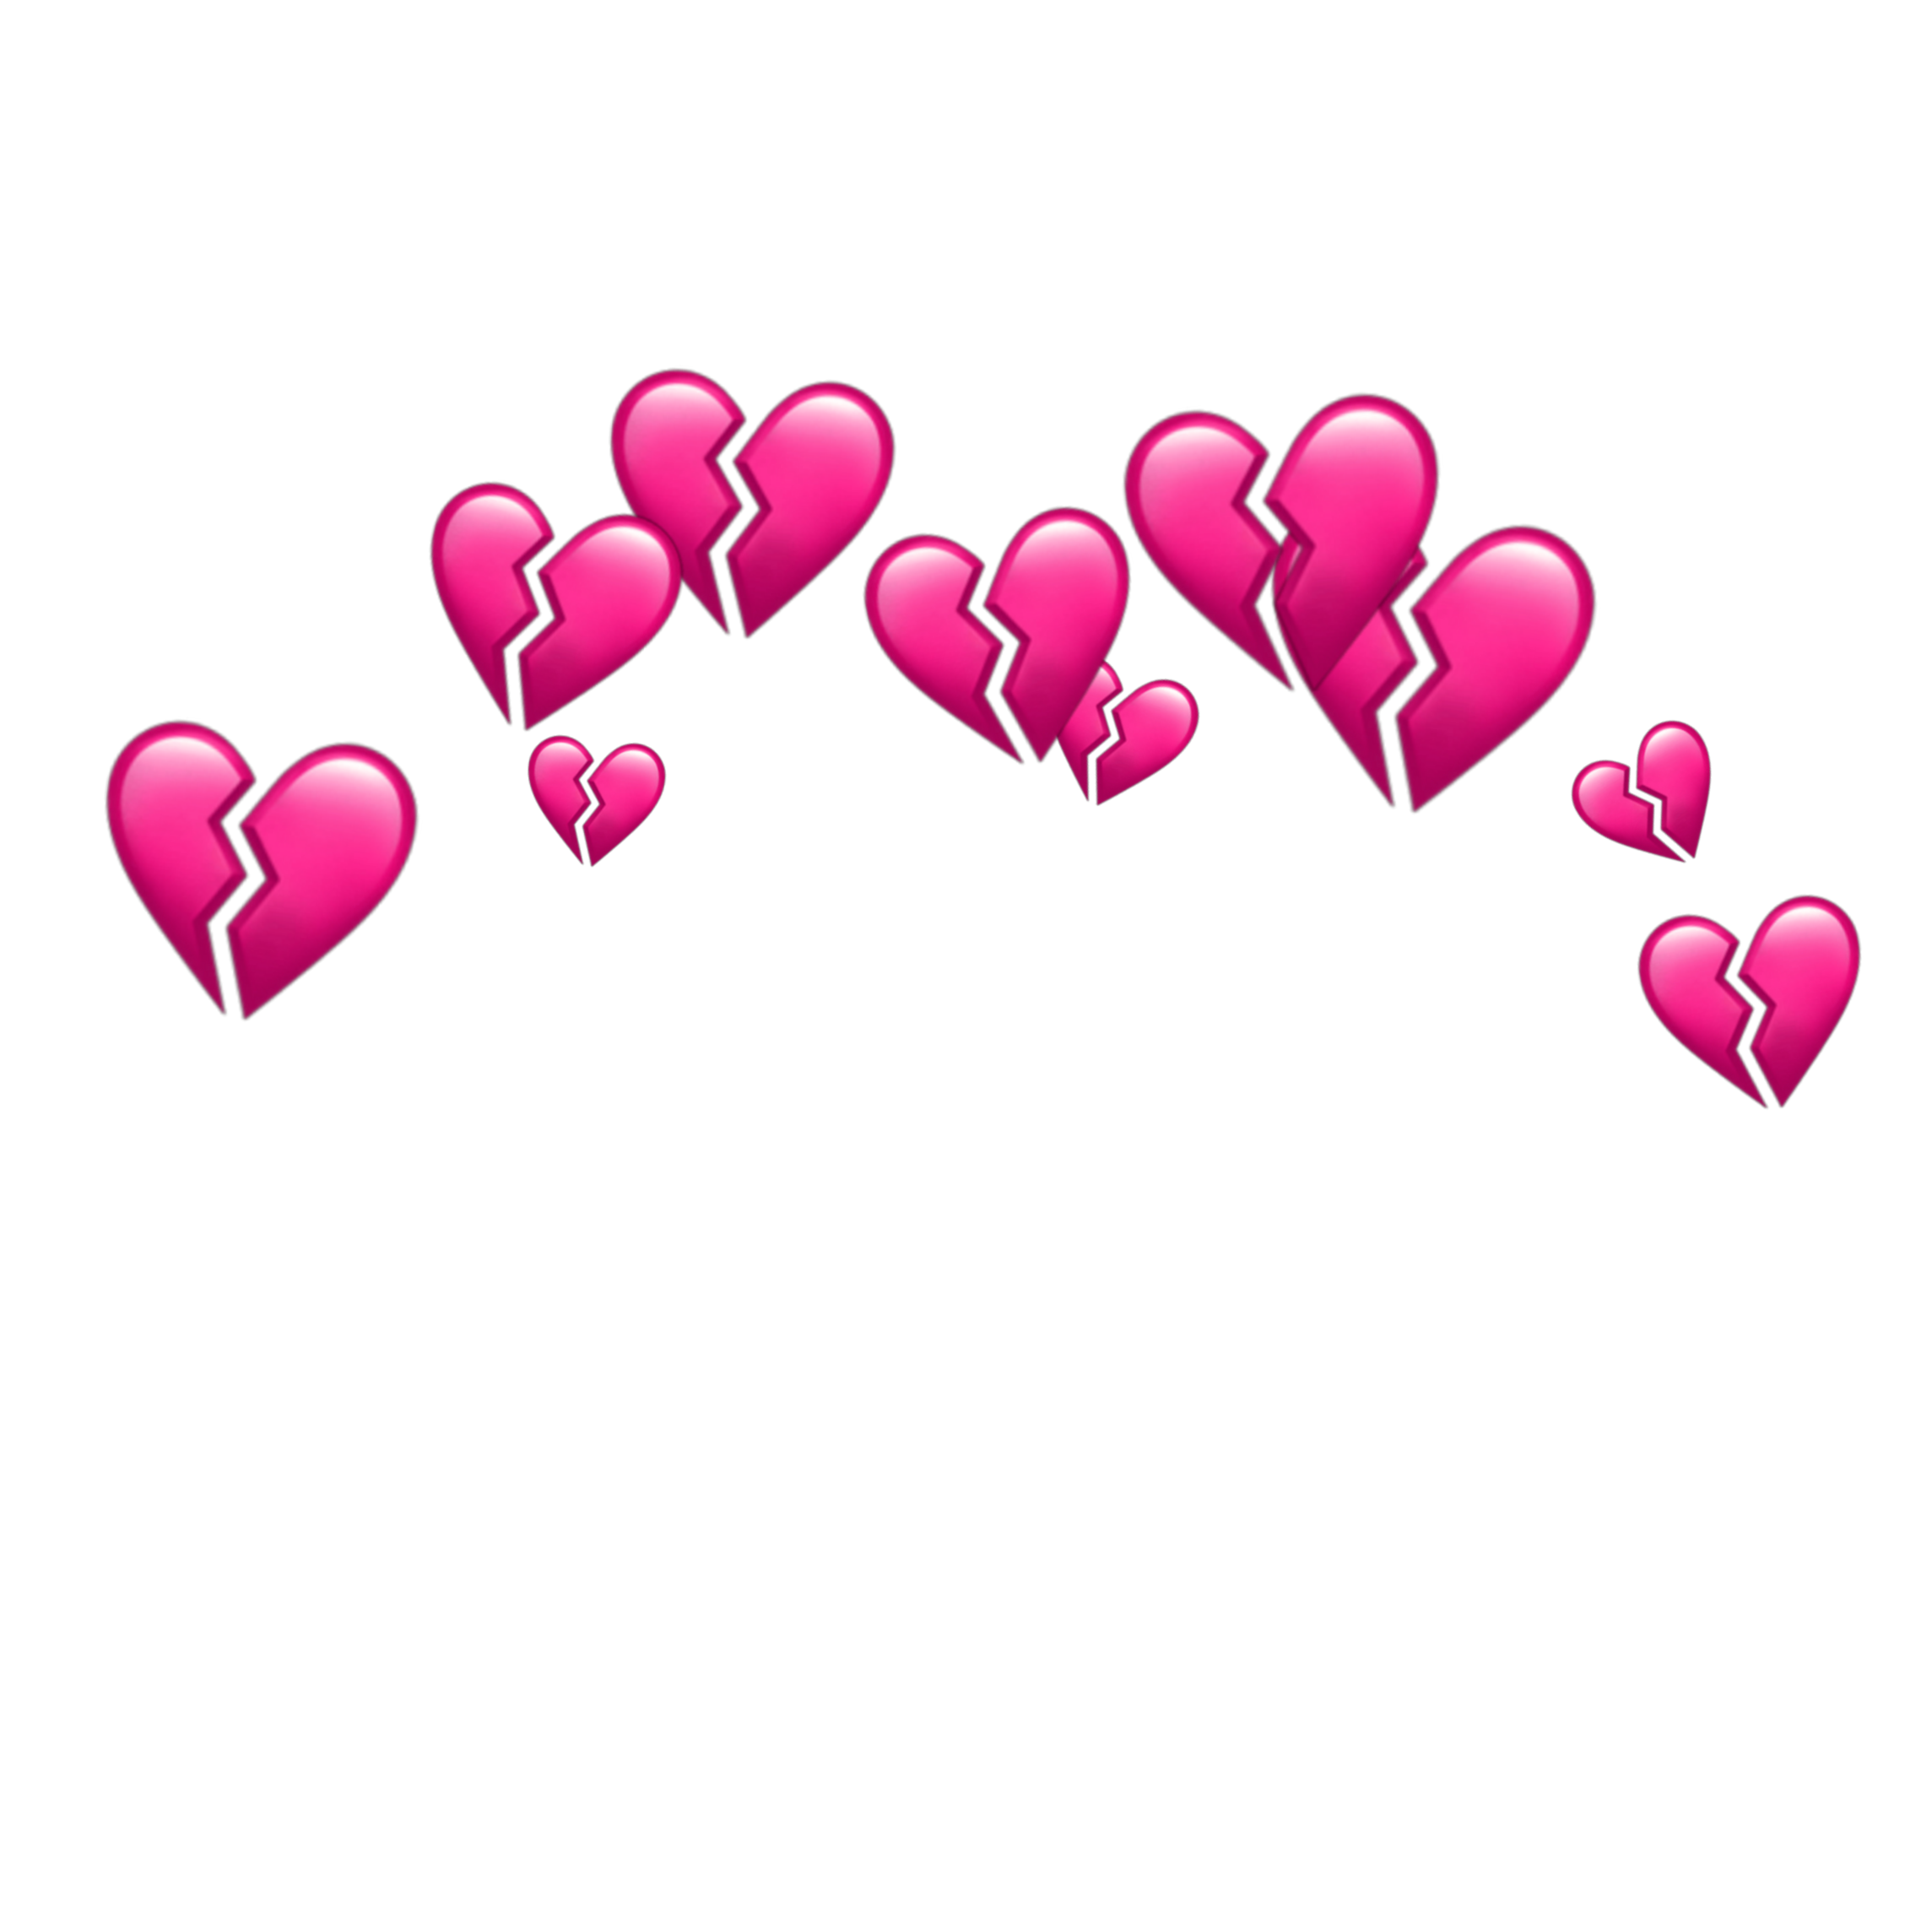 Freetoedit Heart Hearts Crown Tumblr Emoji Emojis Anime Backgrounds Wallpapers Heart Overlay Emoji Wallpaper